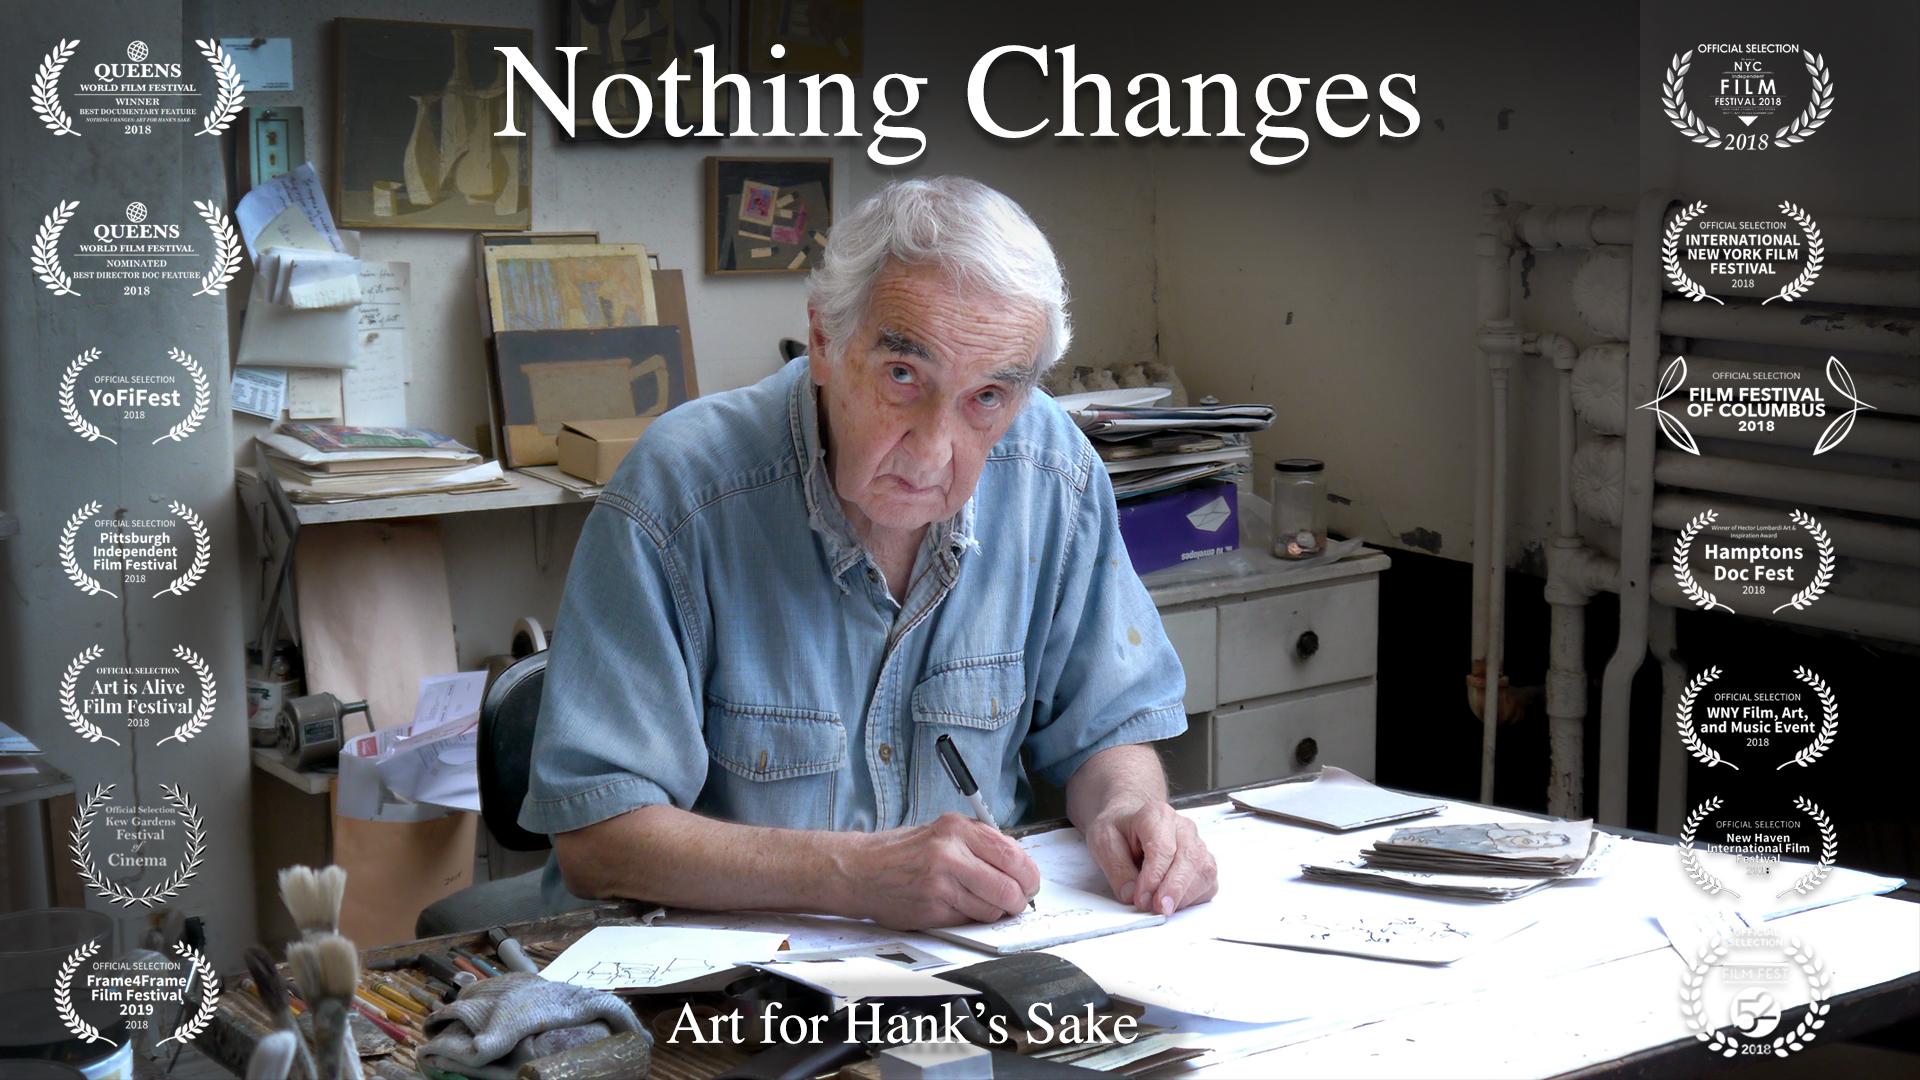 Nothing Changes: Art for Hank's Sake